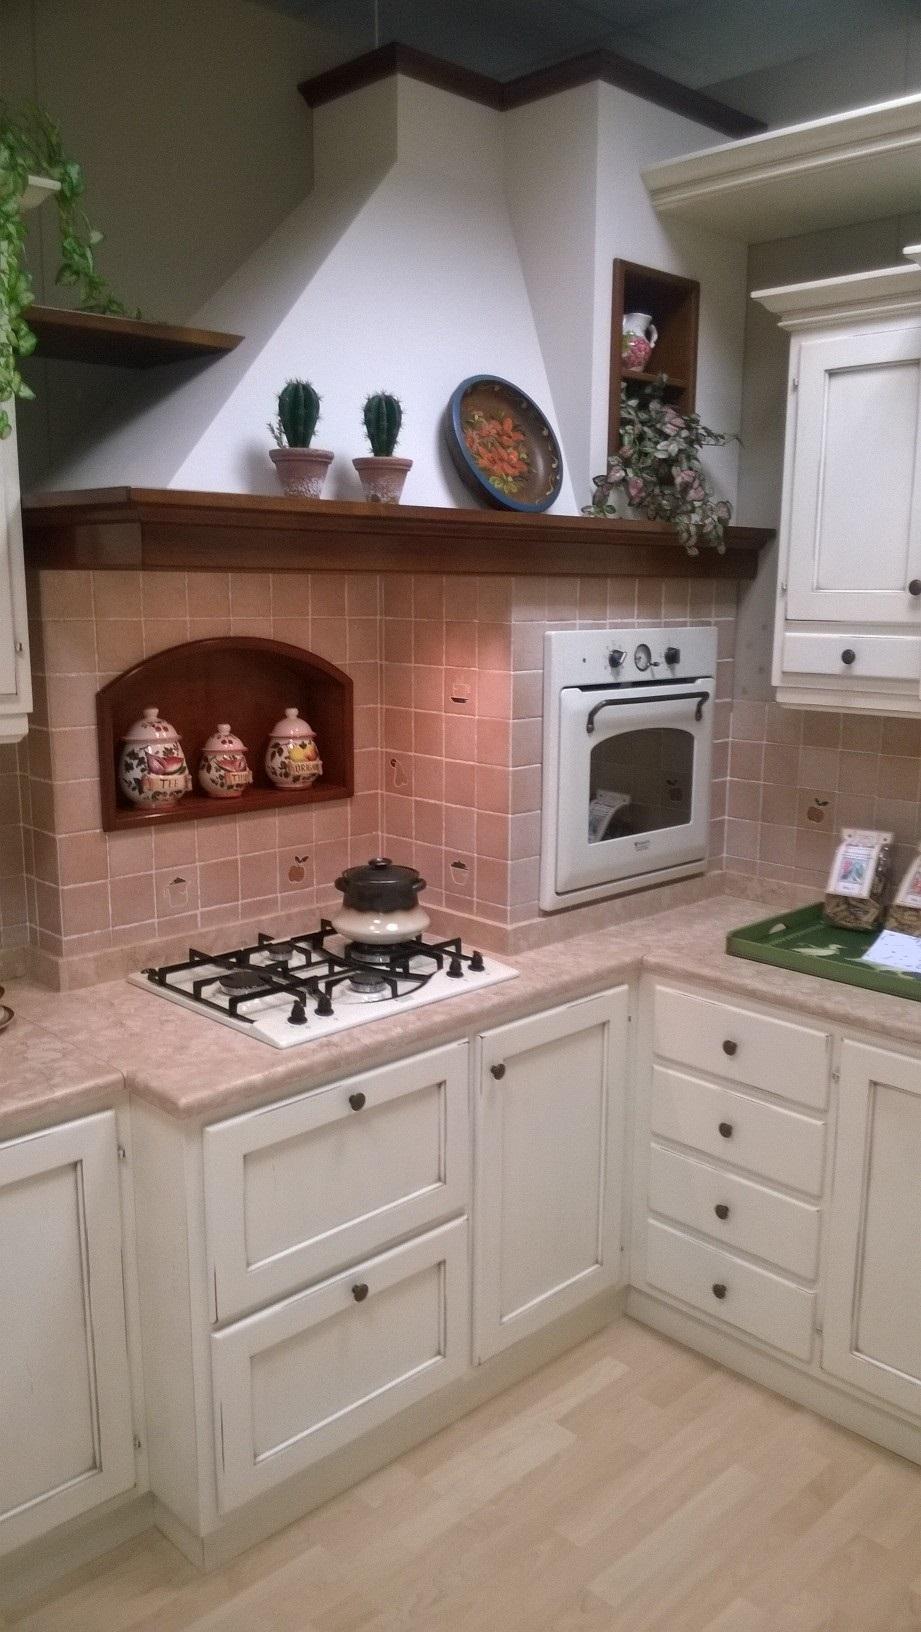 Cucina classica artigianale scontata del 50 cucine a for Cucina classica